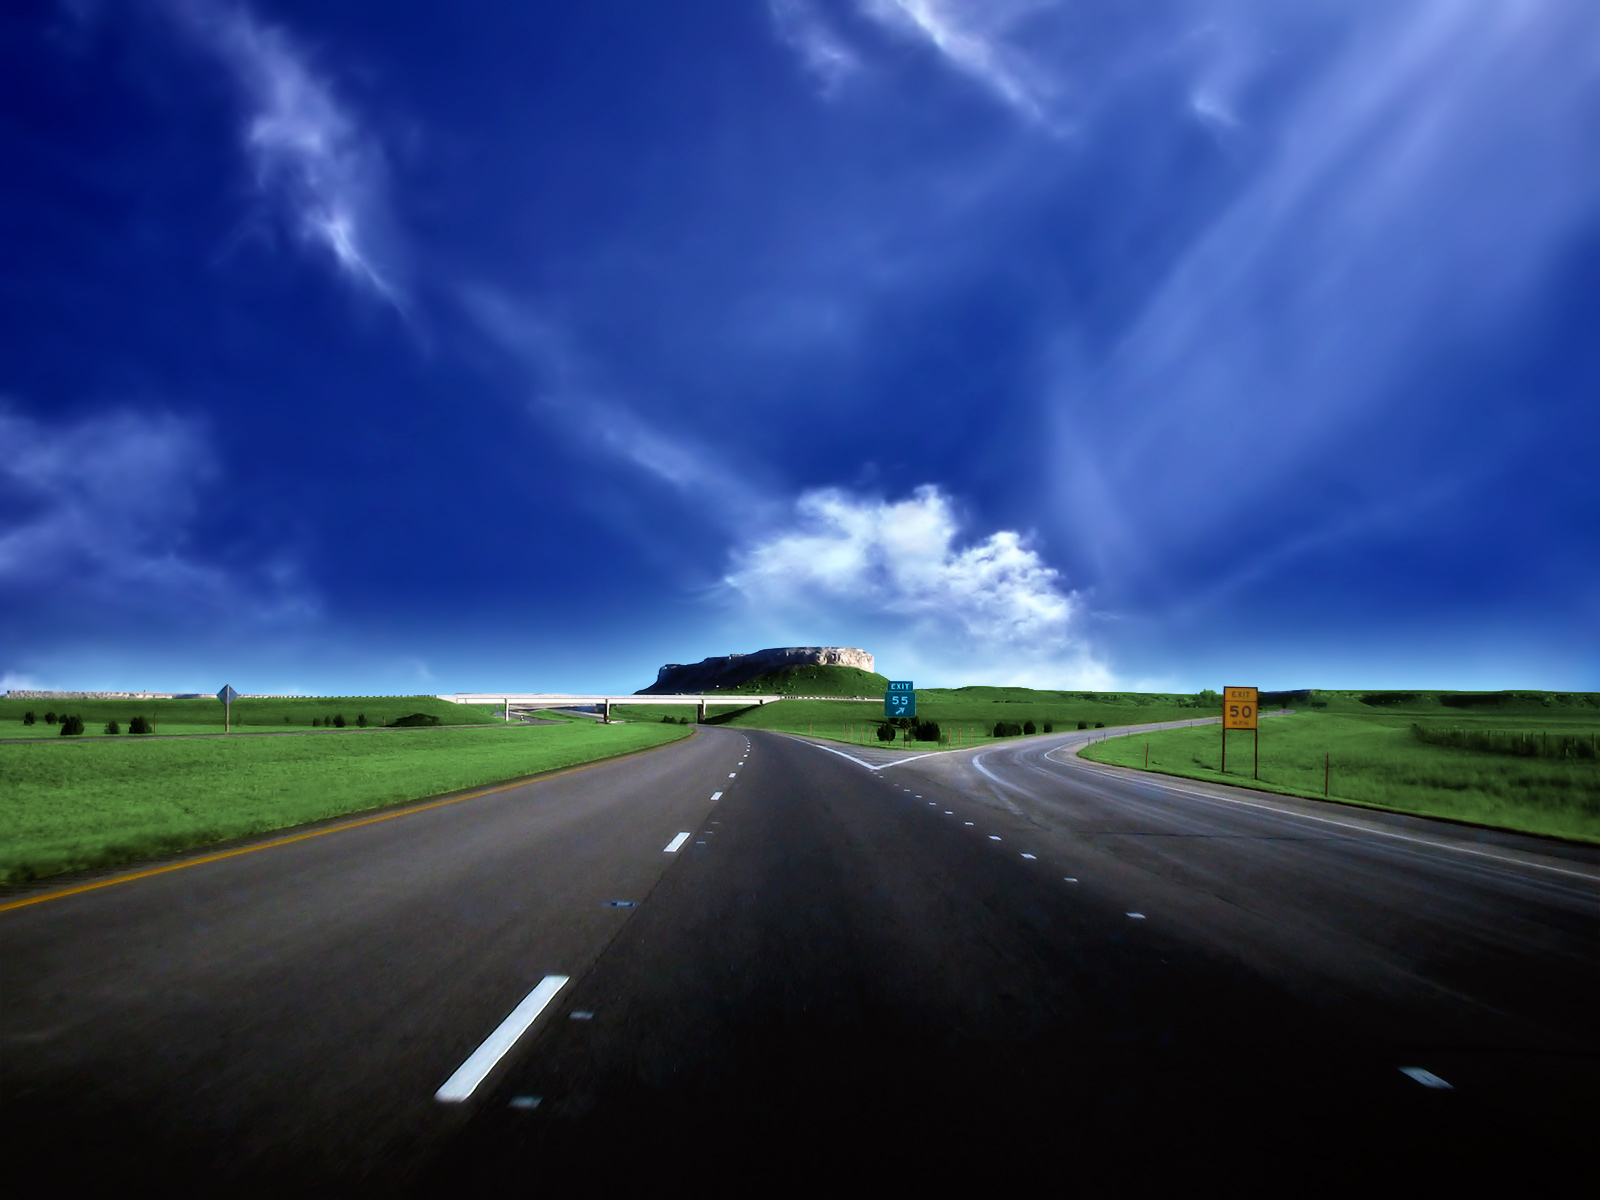 http://1.bp.blogspot.com/-R82b5--qey0/TmcH1WwKTyI/AAAAAAAACJo/YBEpSpuXchA/s1600/travel_0001.jpg